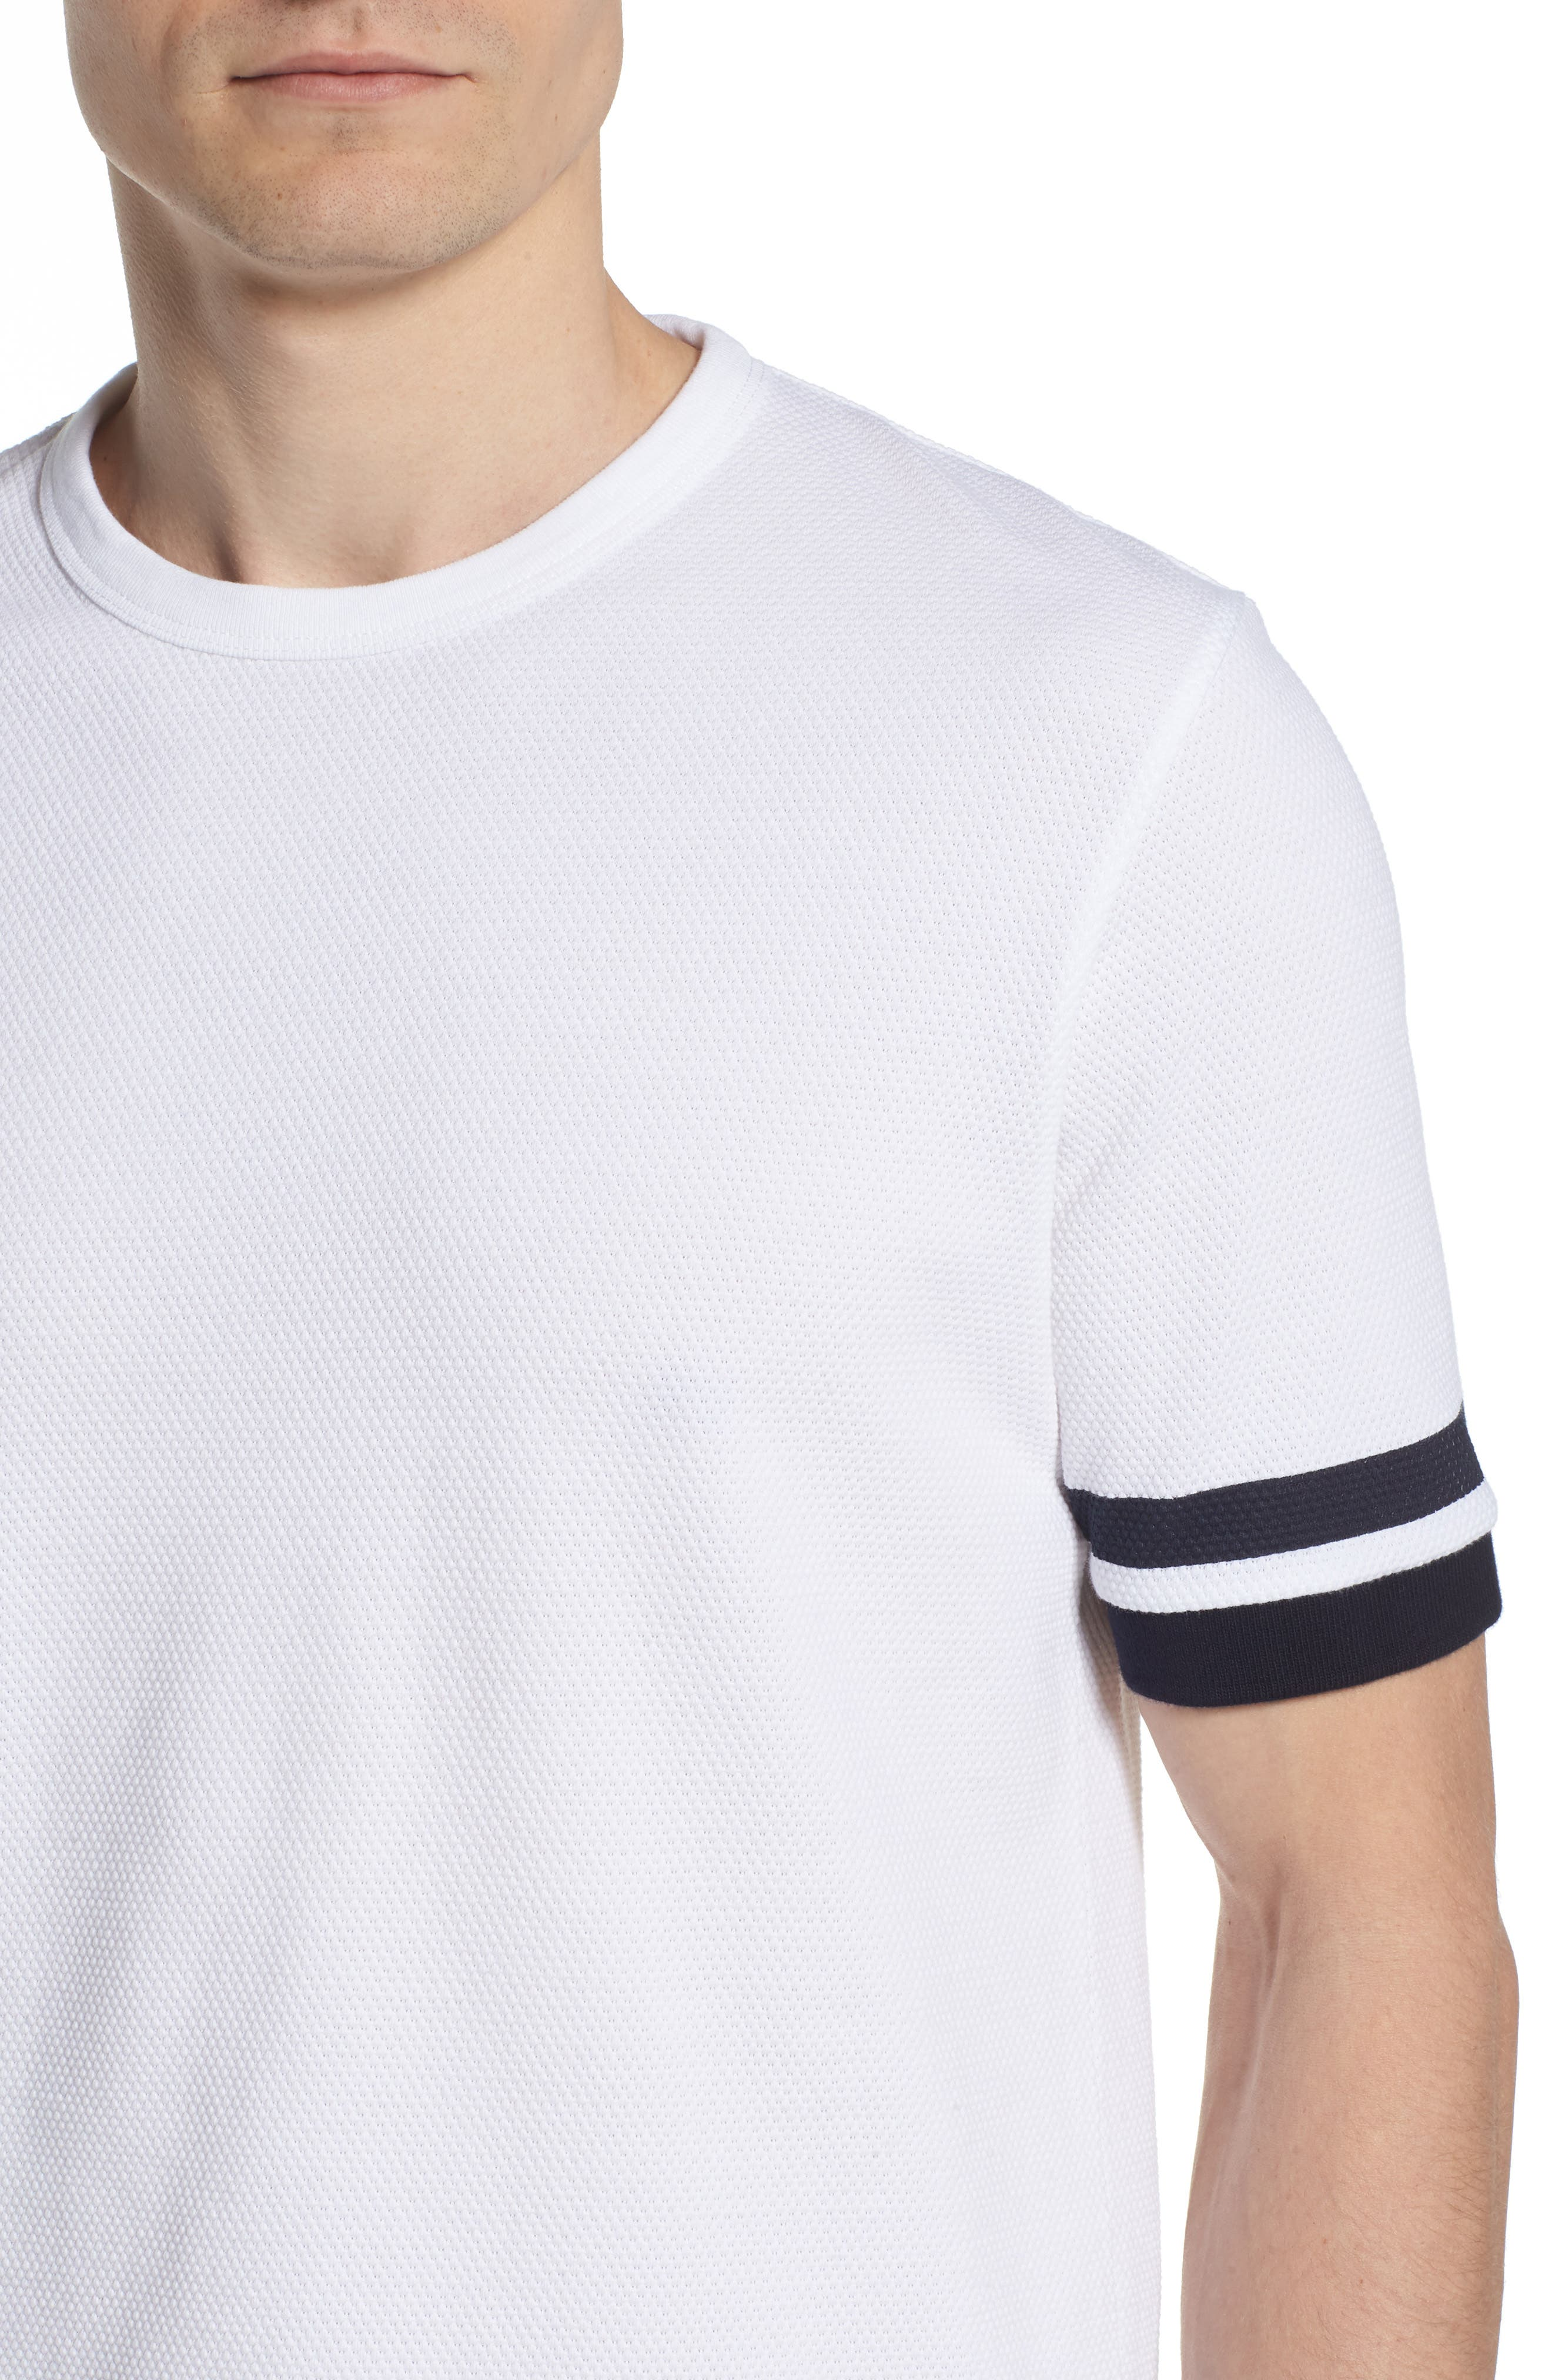 Ampthill Crewneck T-Shirt,                             Alternate thumbnail 4, color,                             100